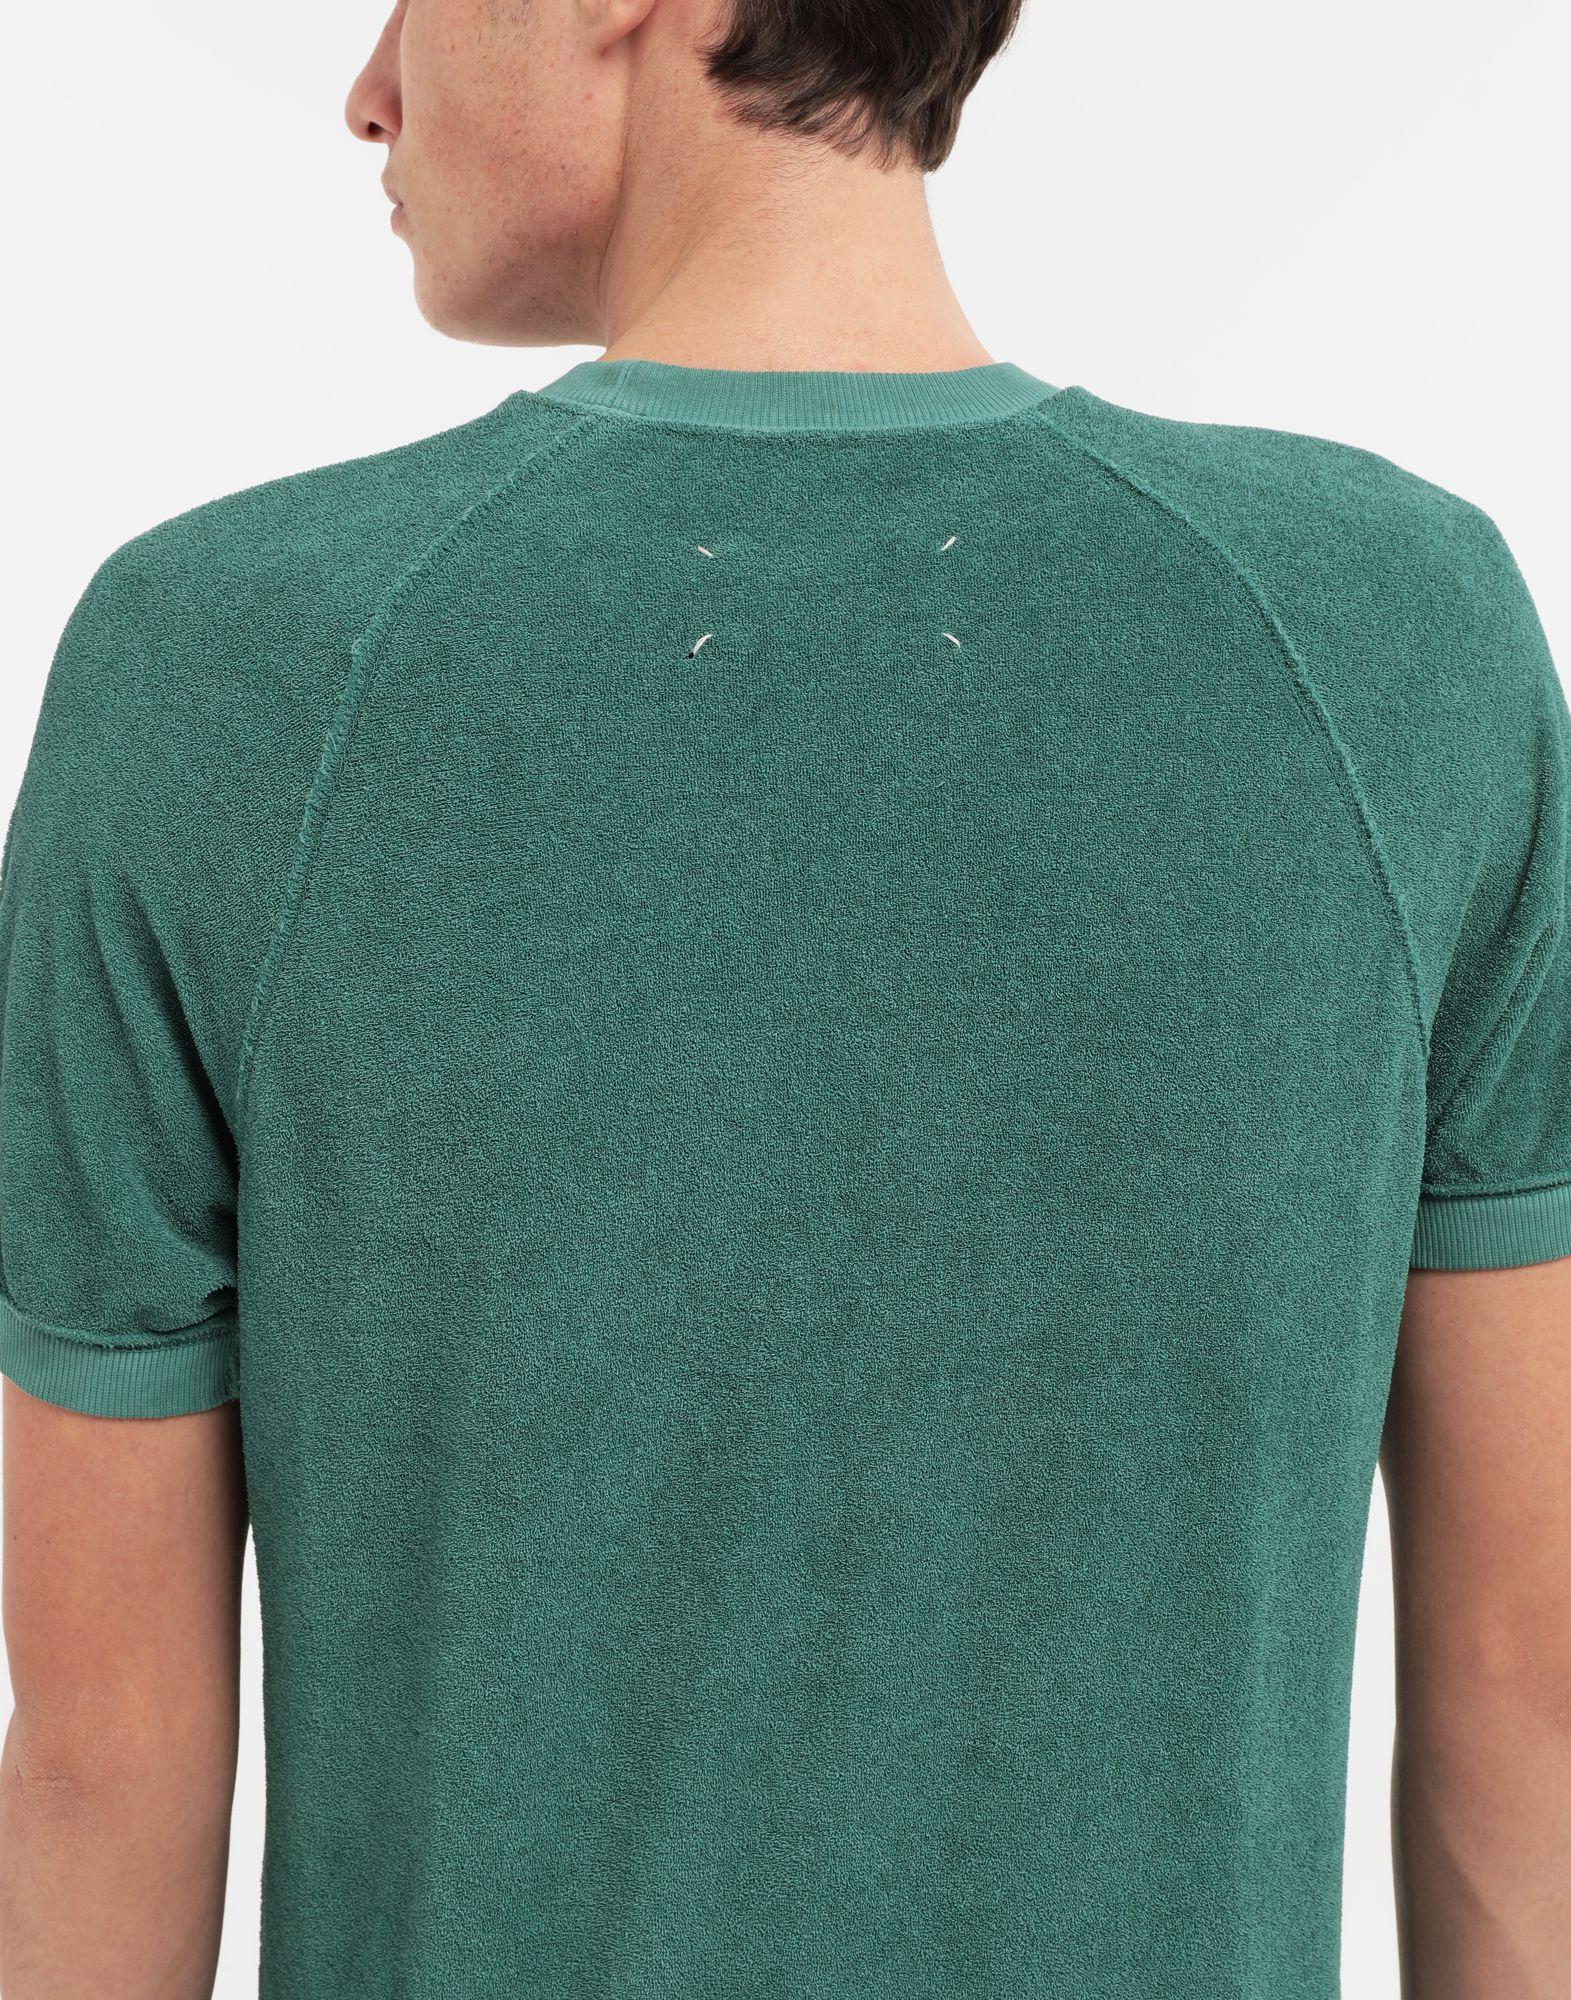 MAISON MARGIELA Graphic printed faded T-shirt Sweatshirt Man b